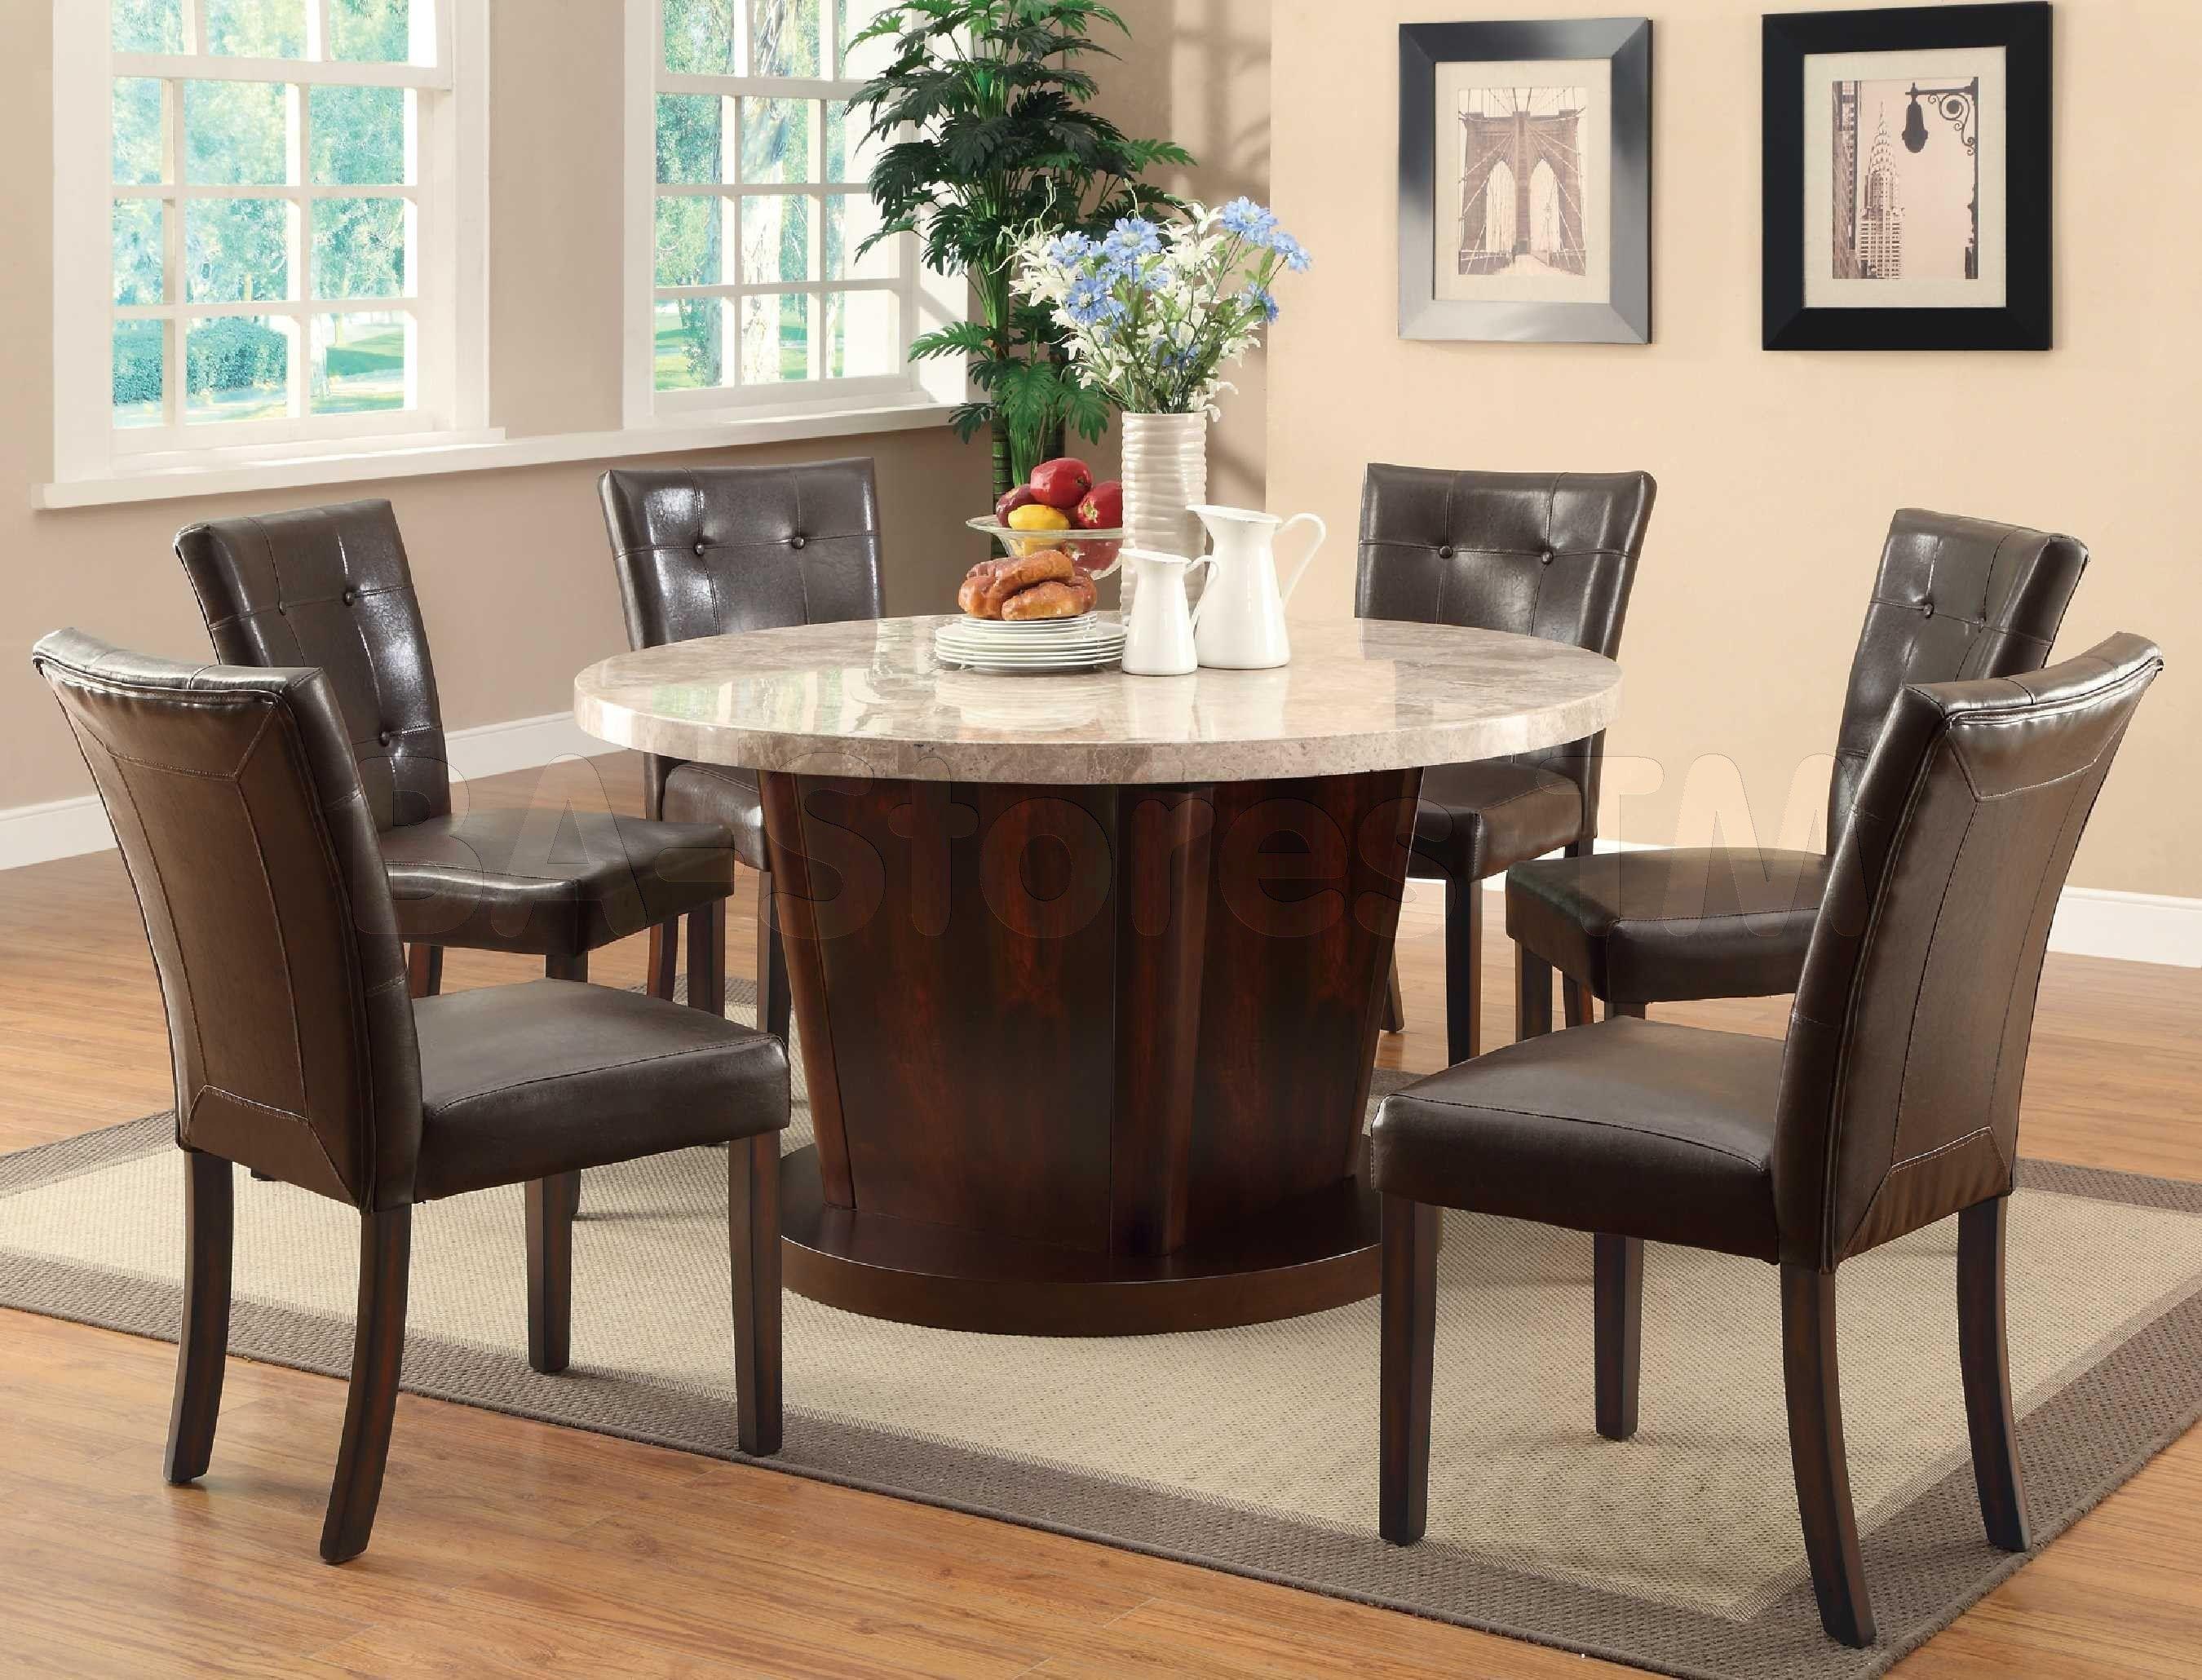 Furniture Best Mid Century Wooden Expandable Round Dining Room Table With Marble Top Dark Wooden Pedestal Dinin Ruang Makan Modern Meja Makan Meja Makan Modern